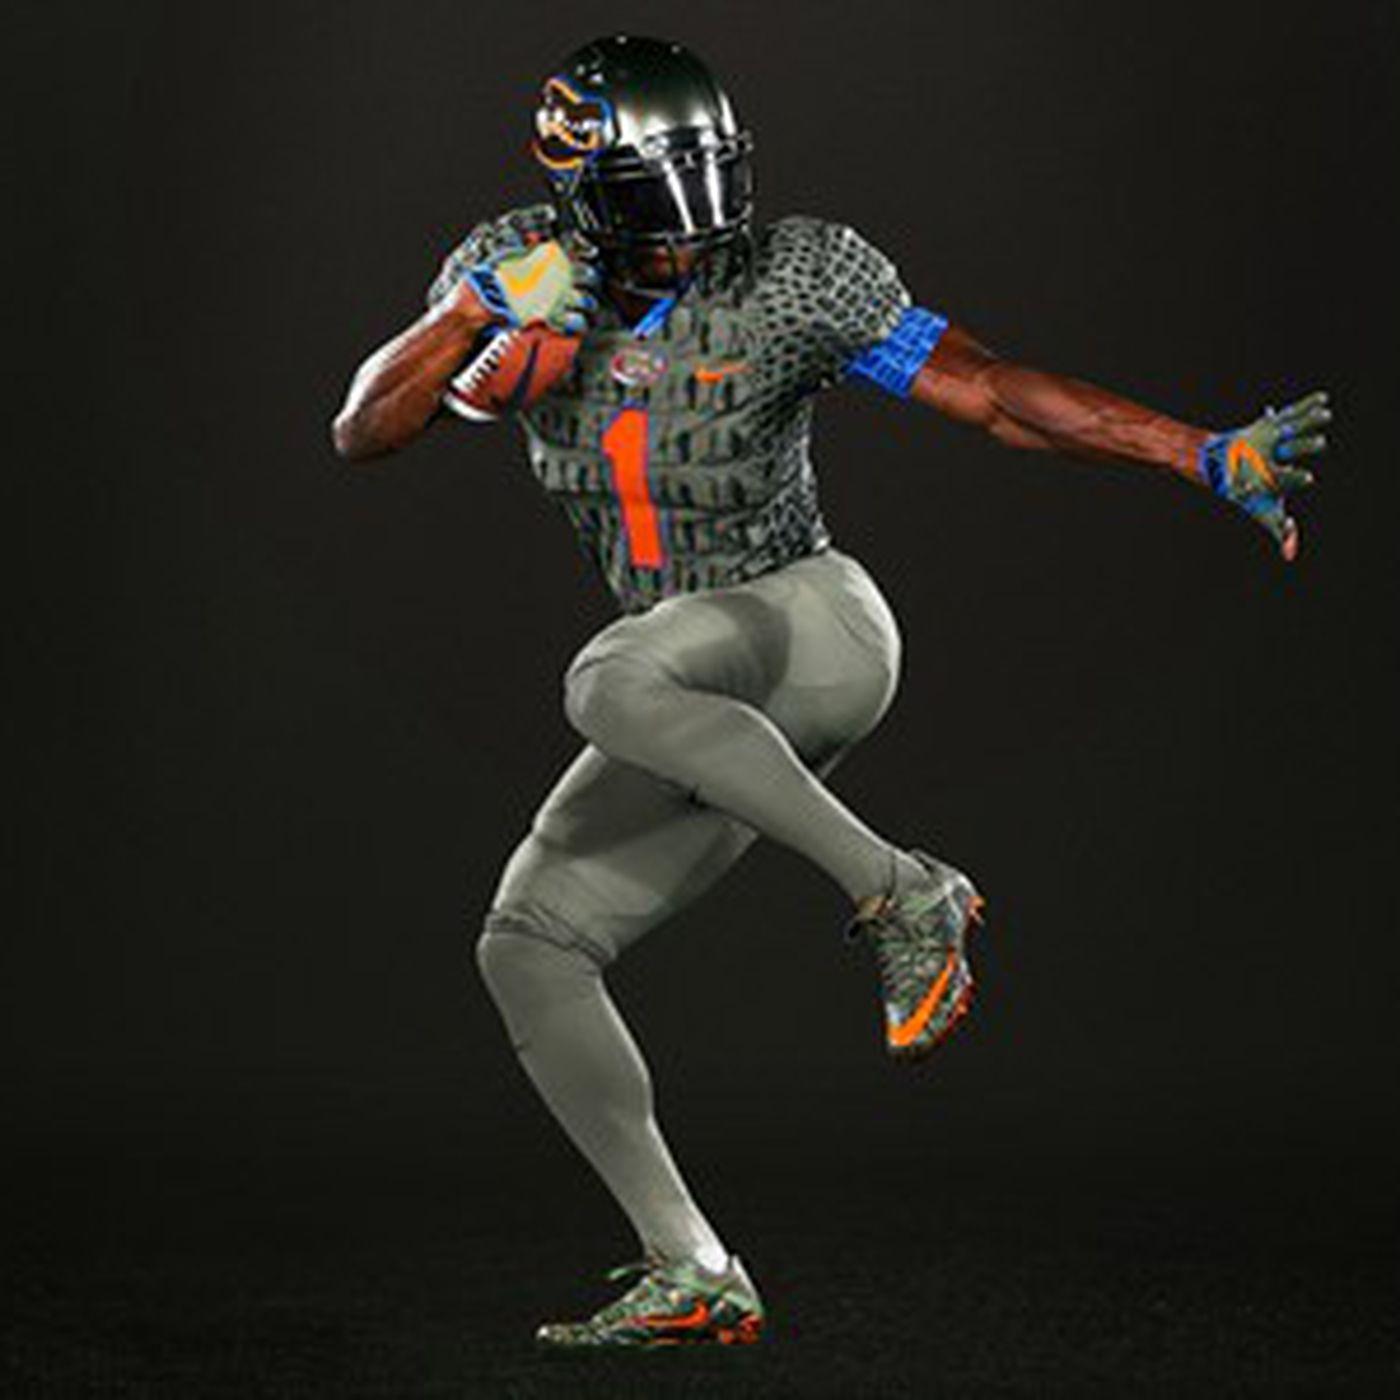 Florida To Wear Alternate Swamp Green Nike Uniforms Vs Texas A M Alligator Army